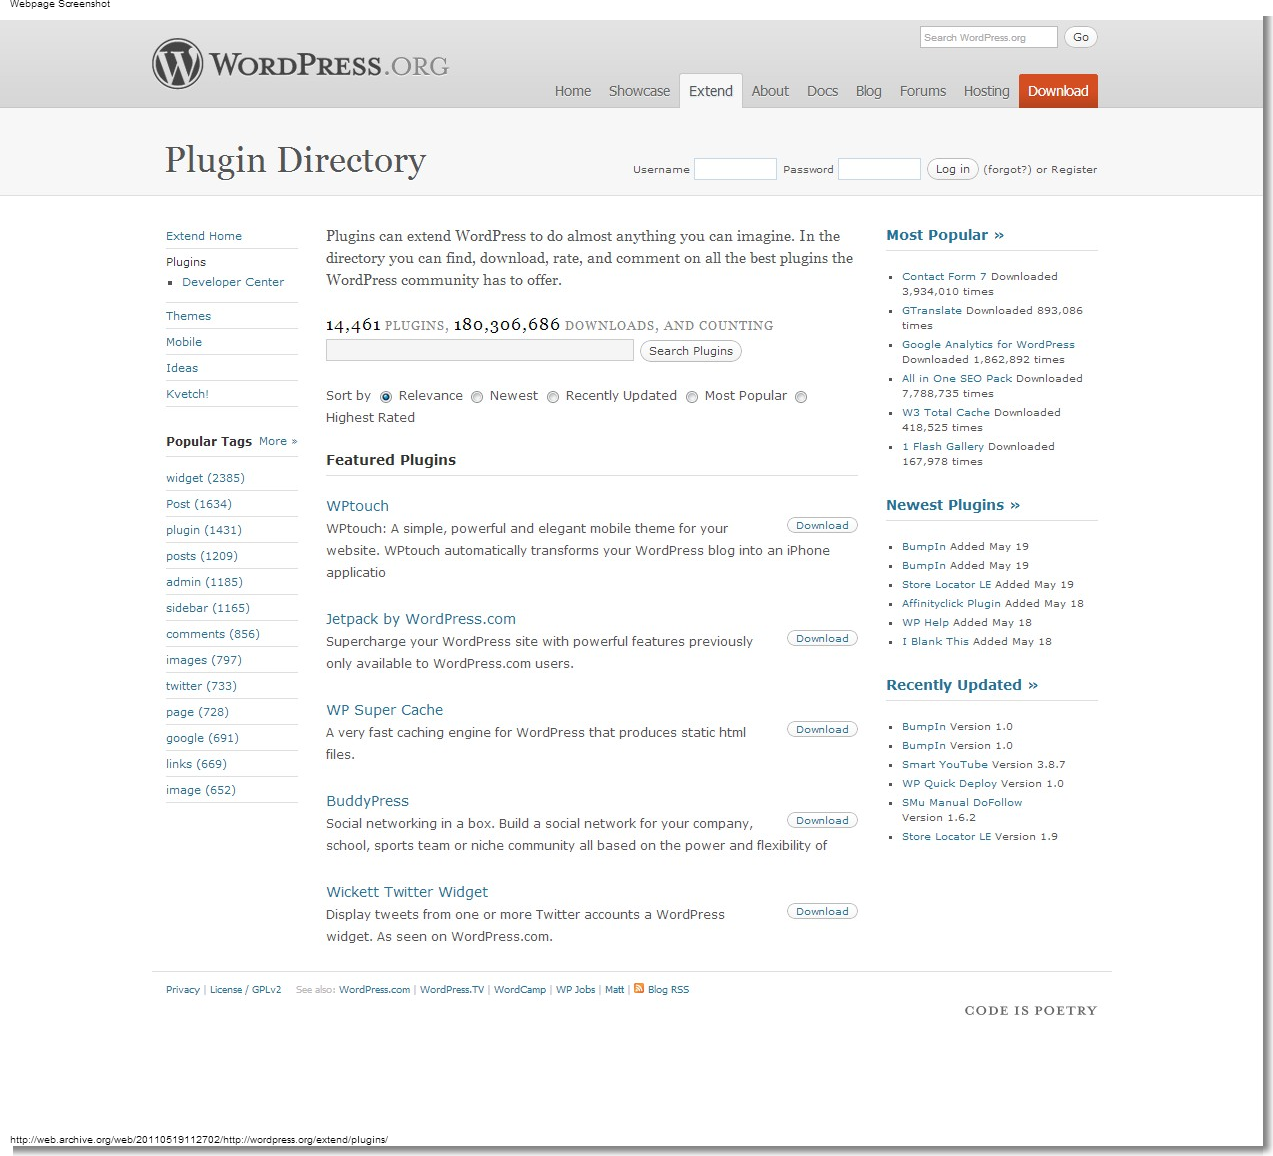 May 19, 2011 - WordPress - WordPress Plugins